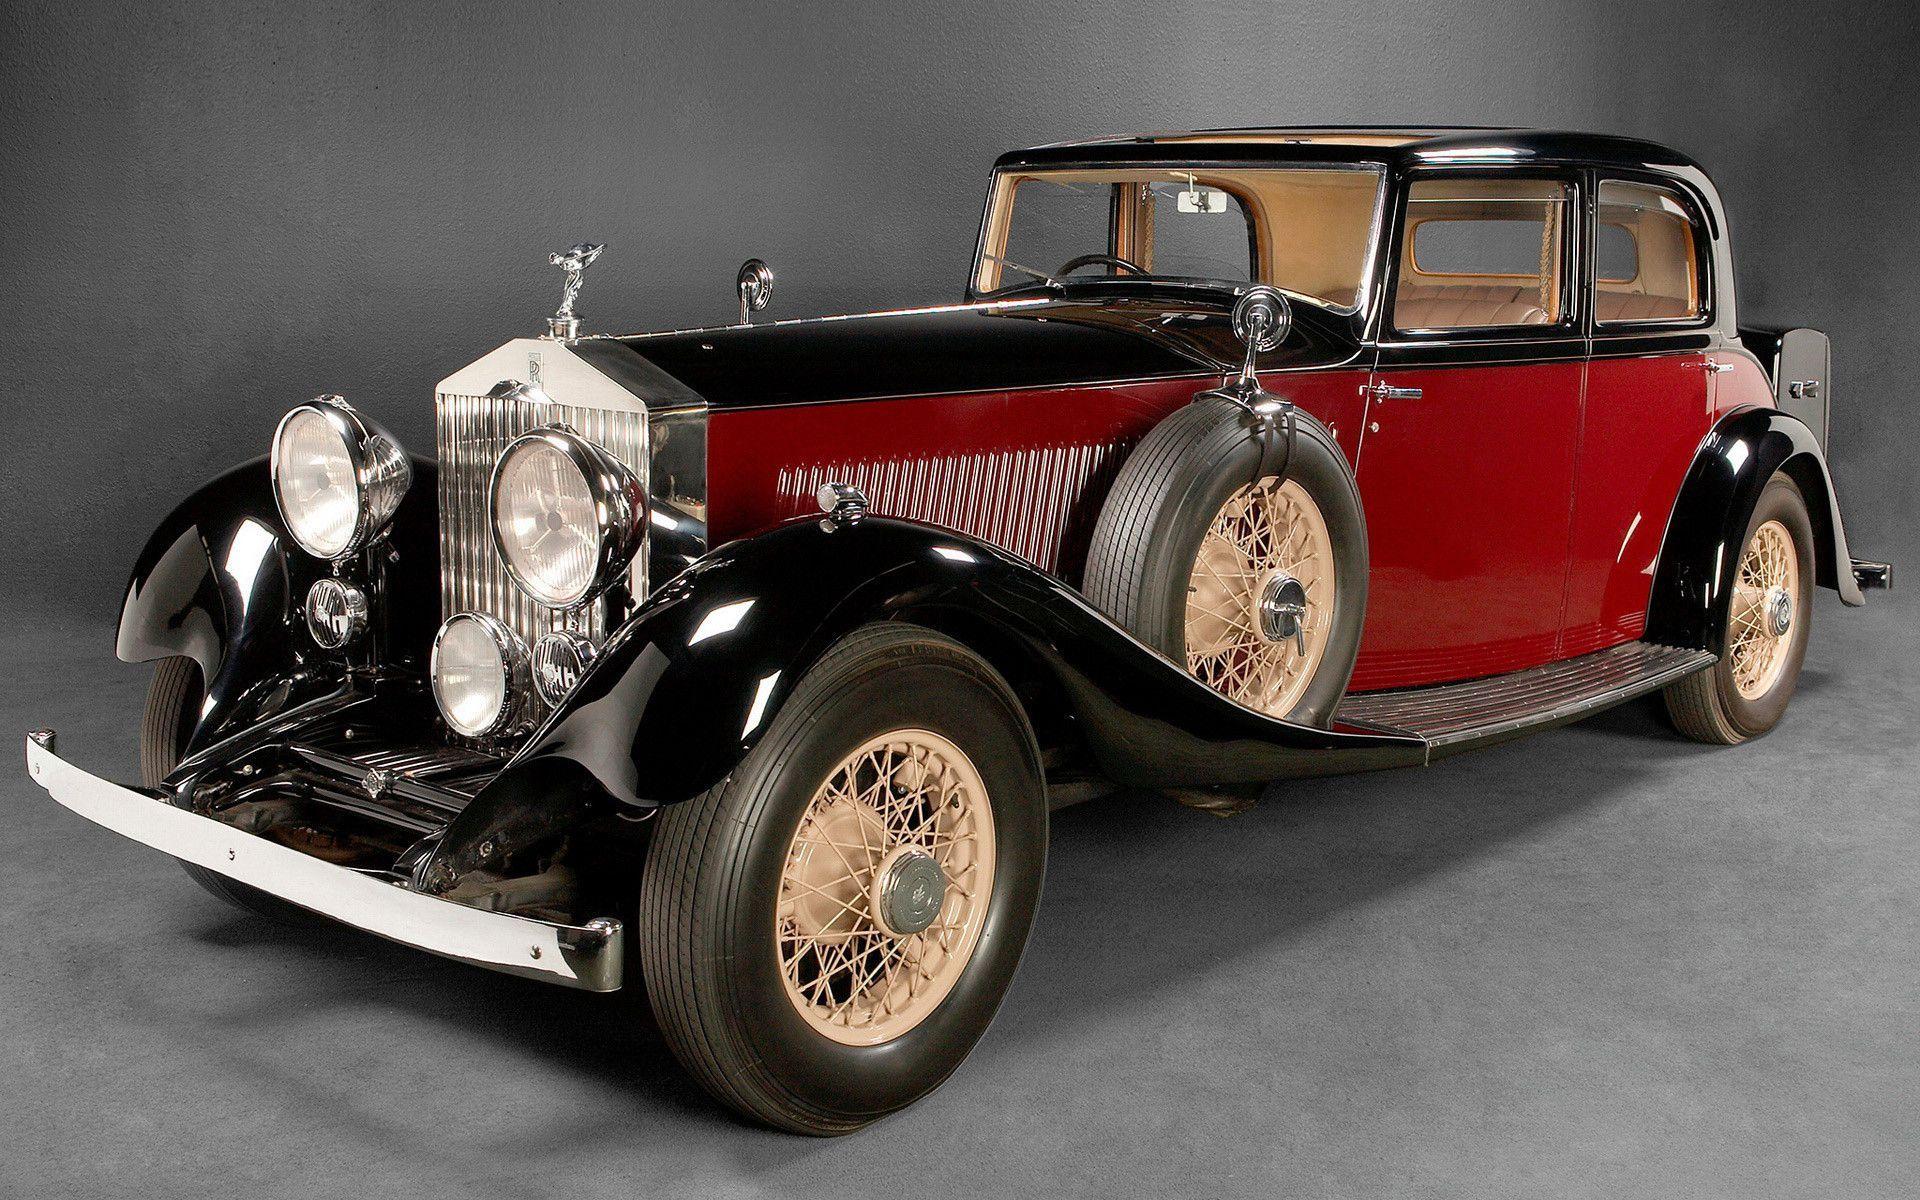 Hd Nice Old Car Wallpaper Download Free 137310 Rolls Royce